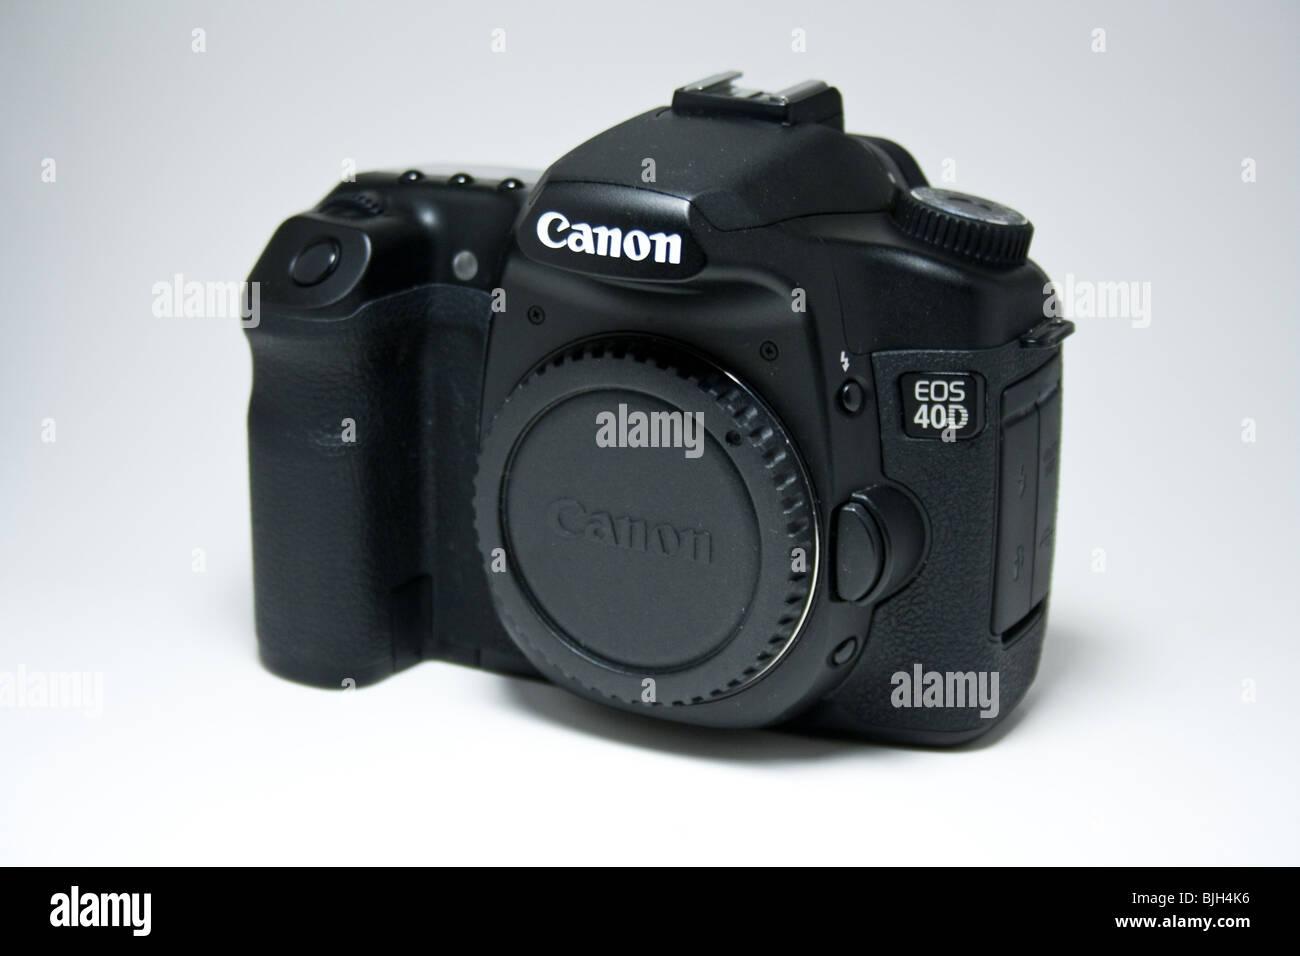 canon digital camera dslr slr advance 40d eos Japanese black product isolated - Stock Image